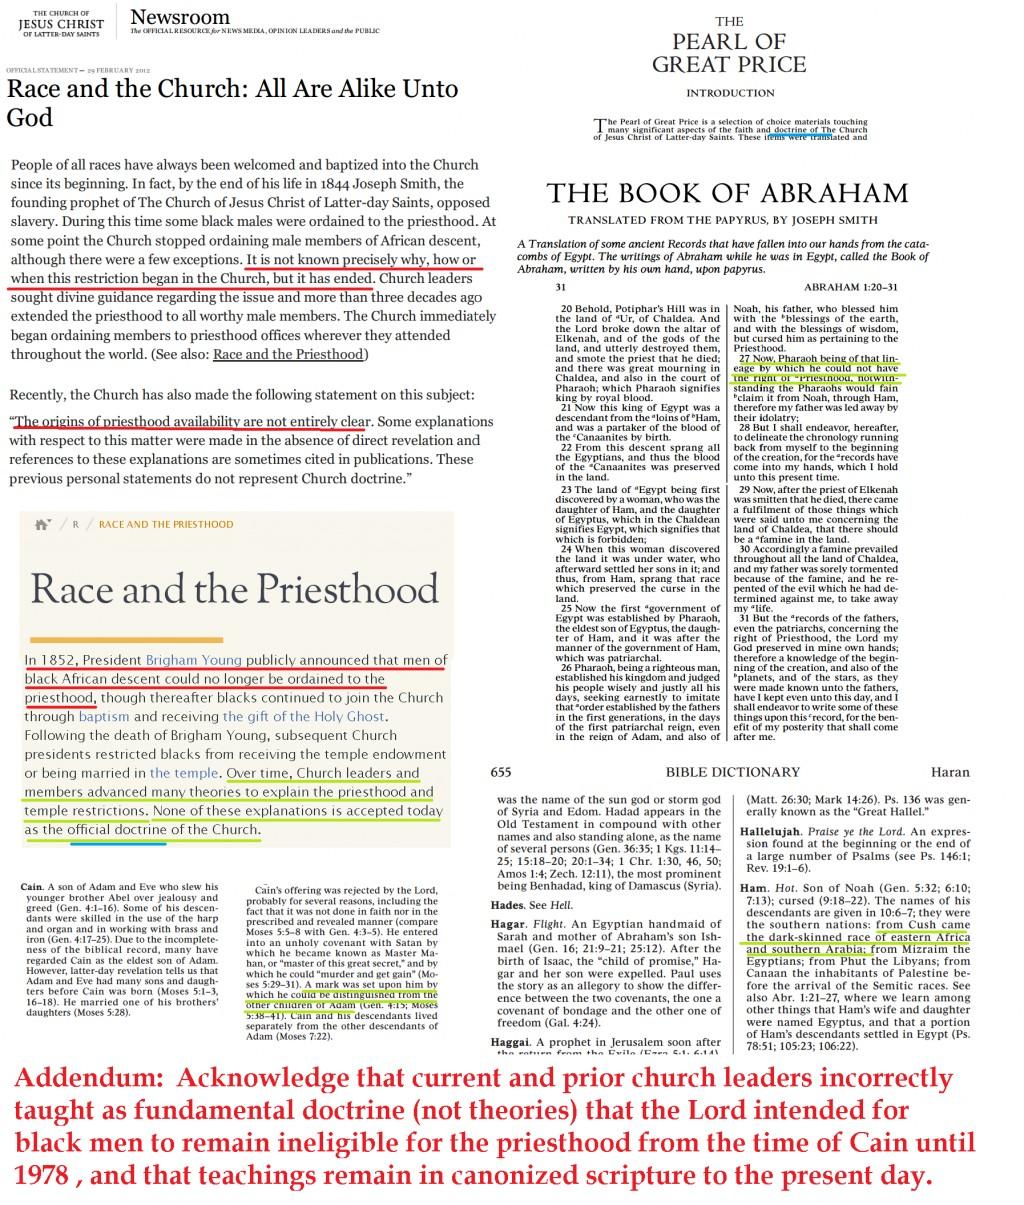 021 Essay Example Black And Priesthood Gospel Topics Outstanding Essays Book Of Abraham Pdf Mormon Translation Large